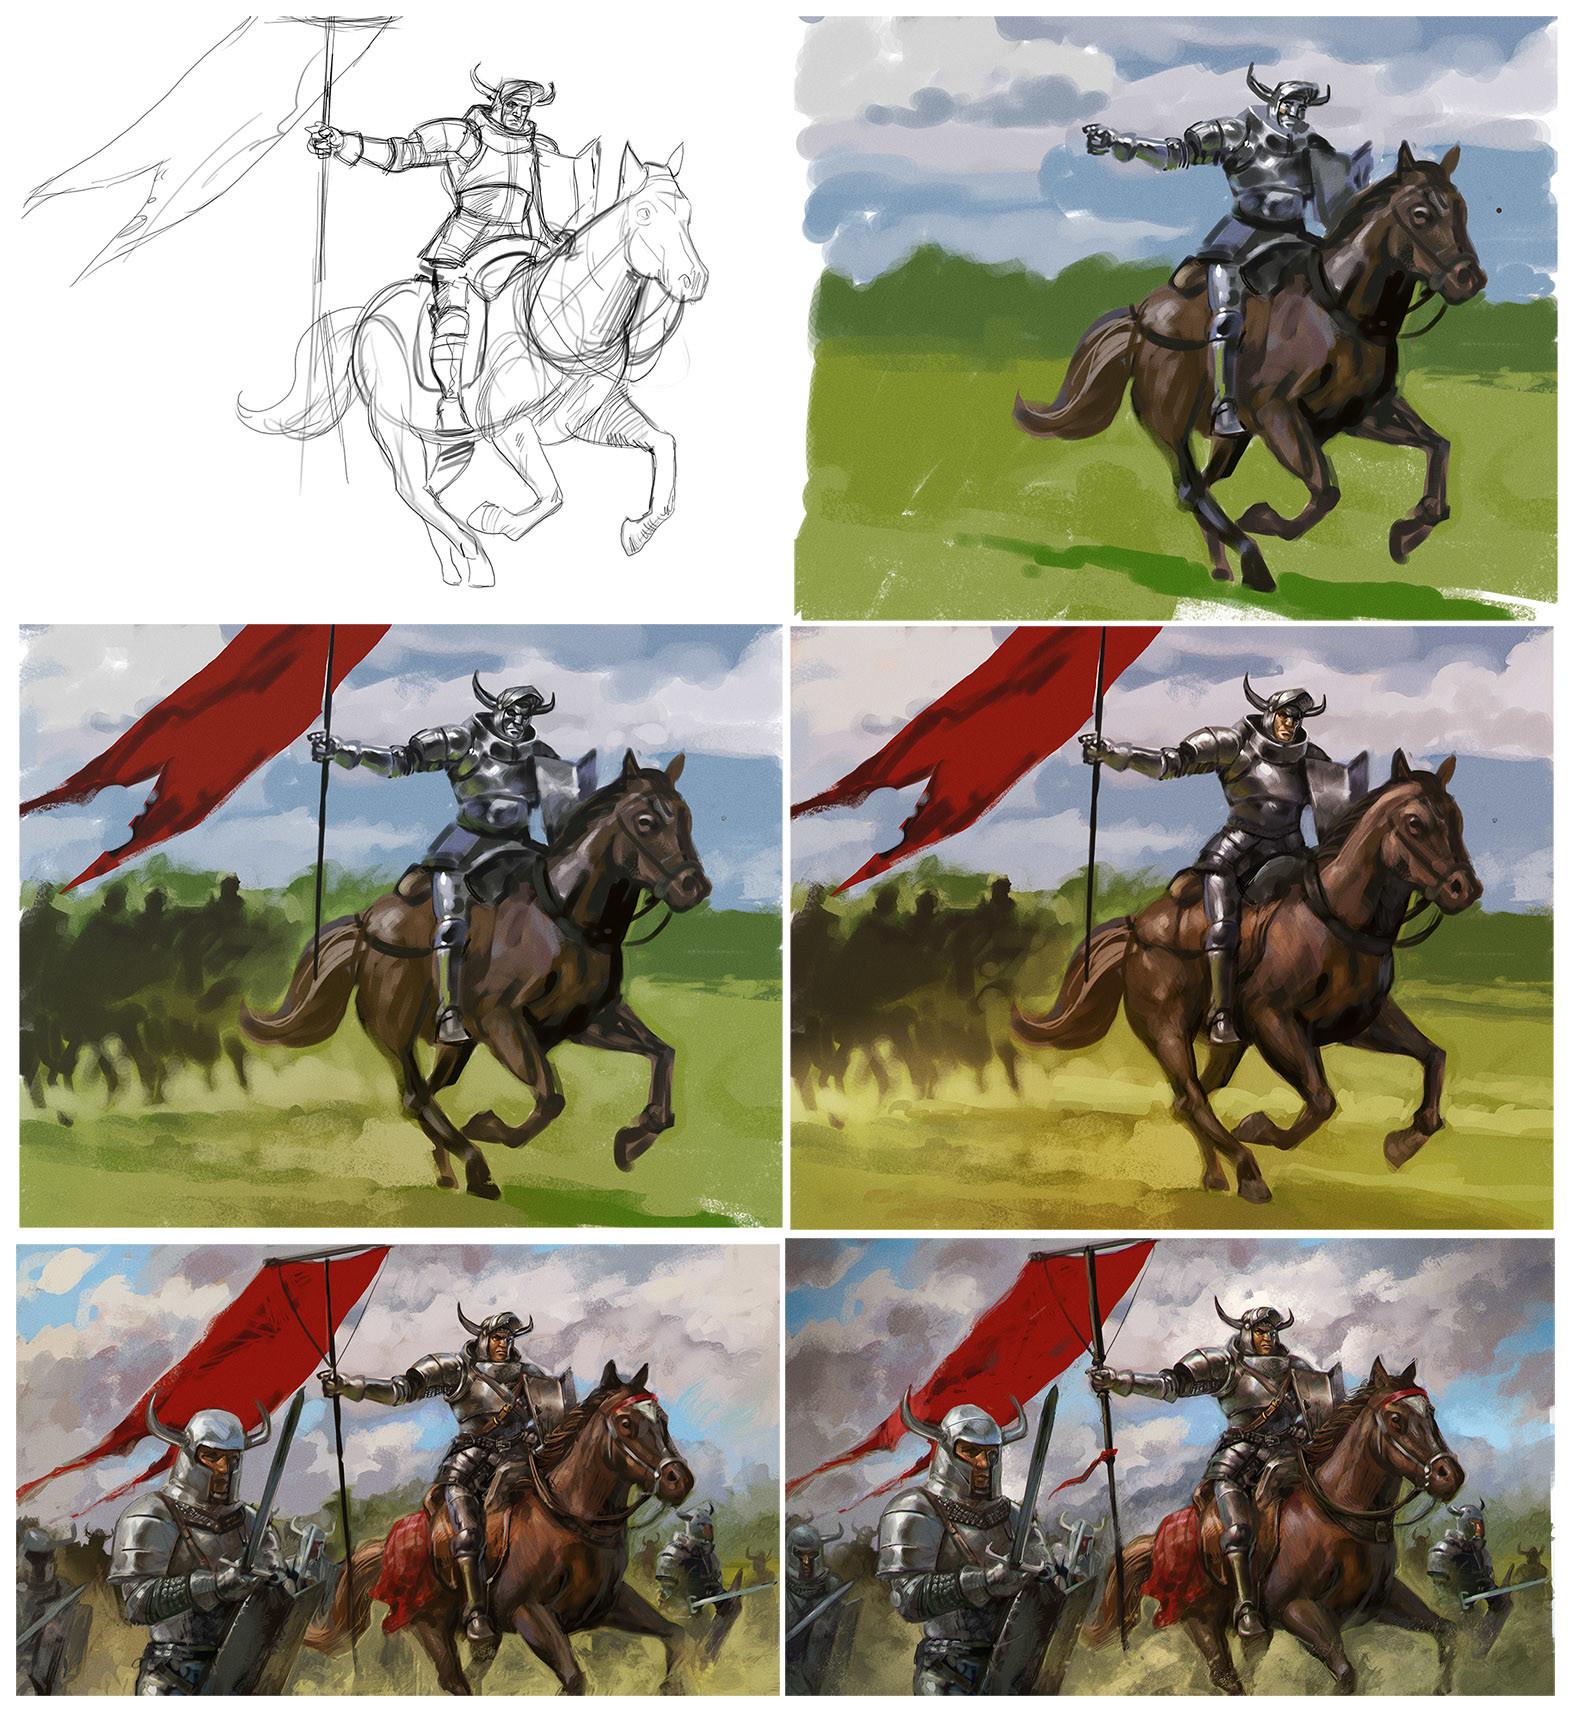 Rafal szlapa knight making off